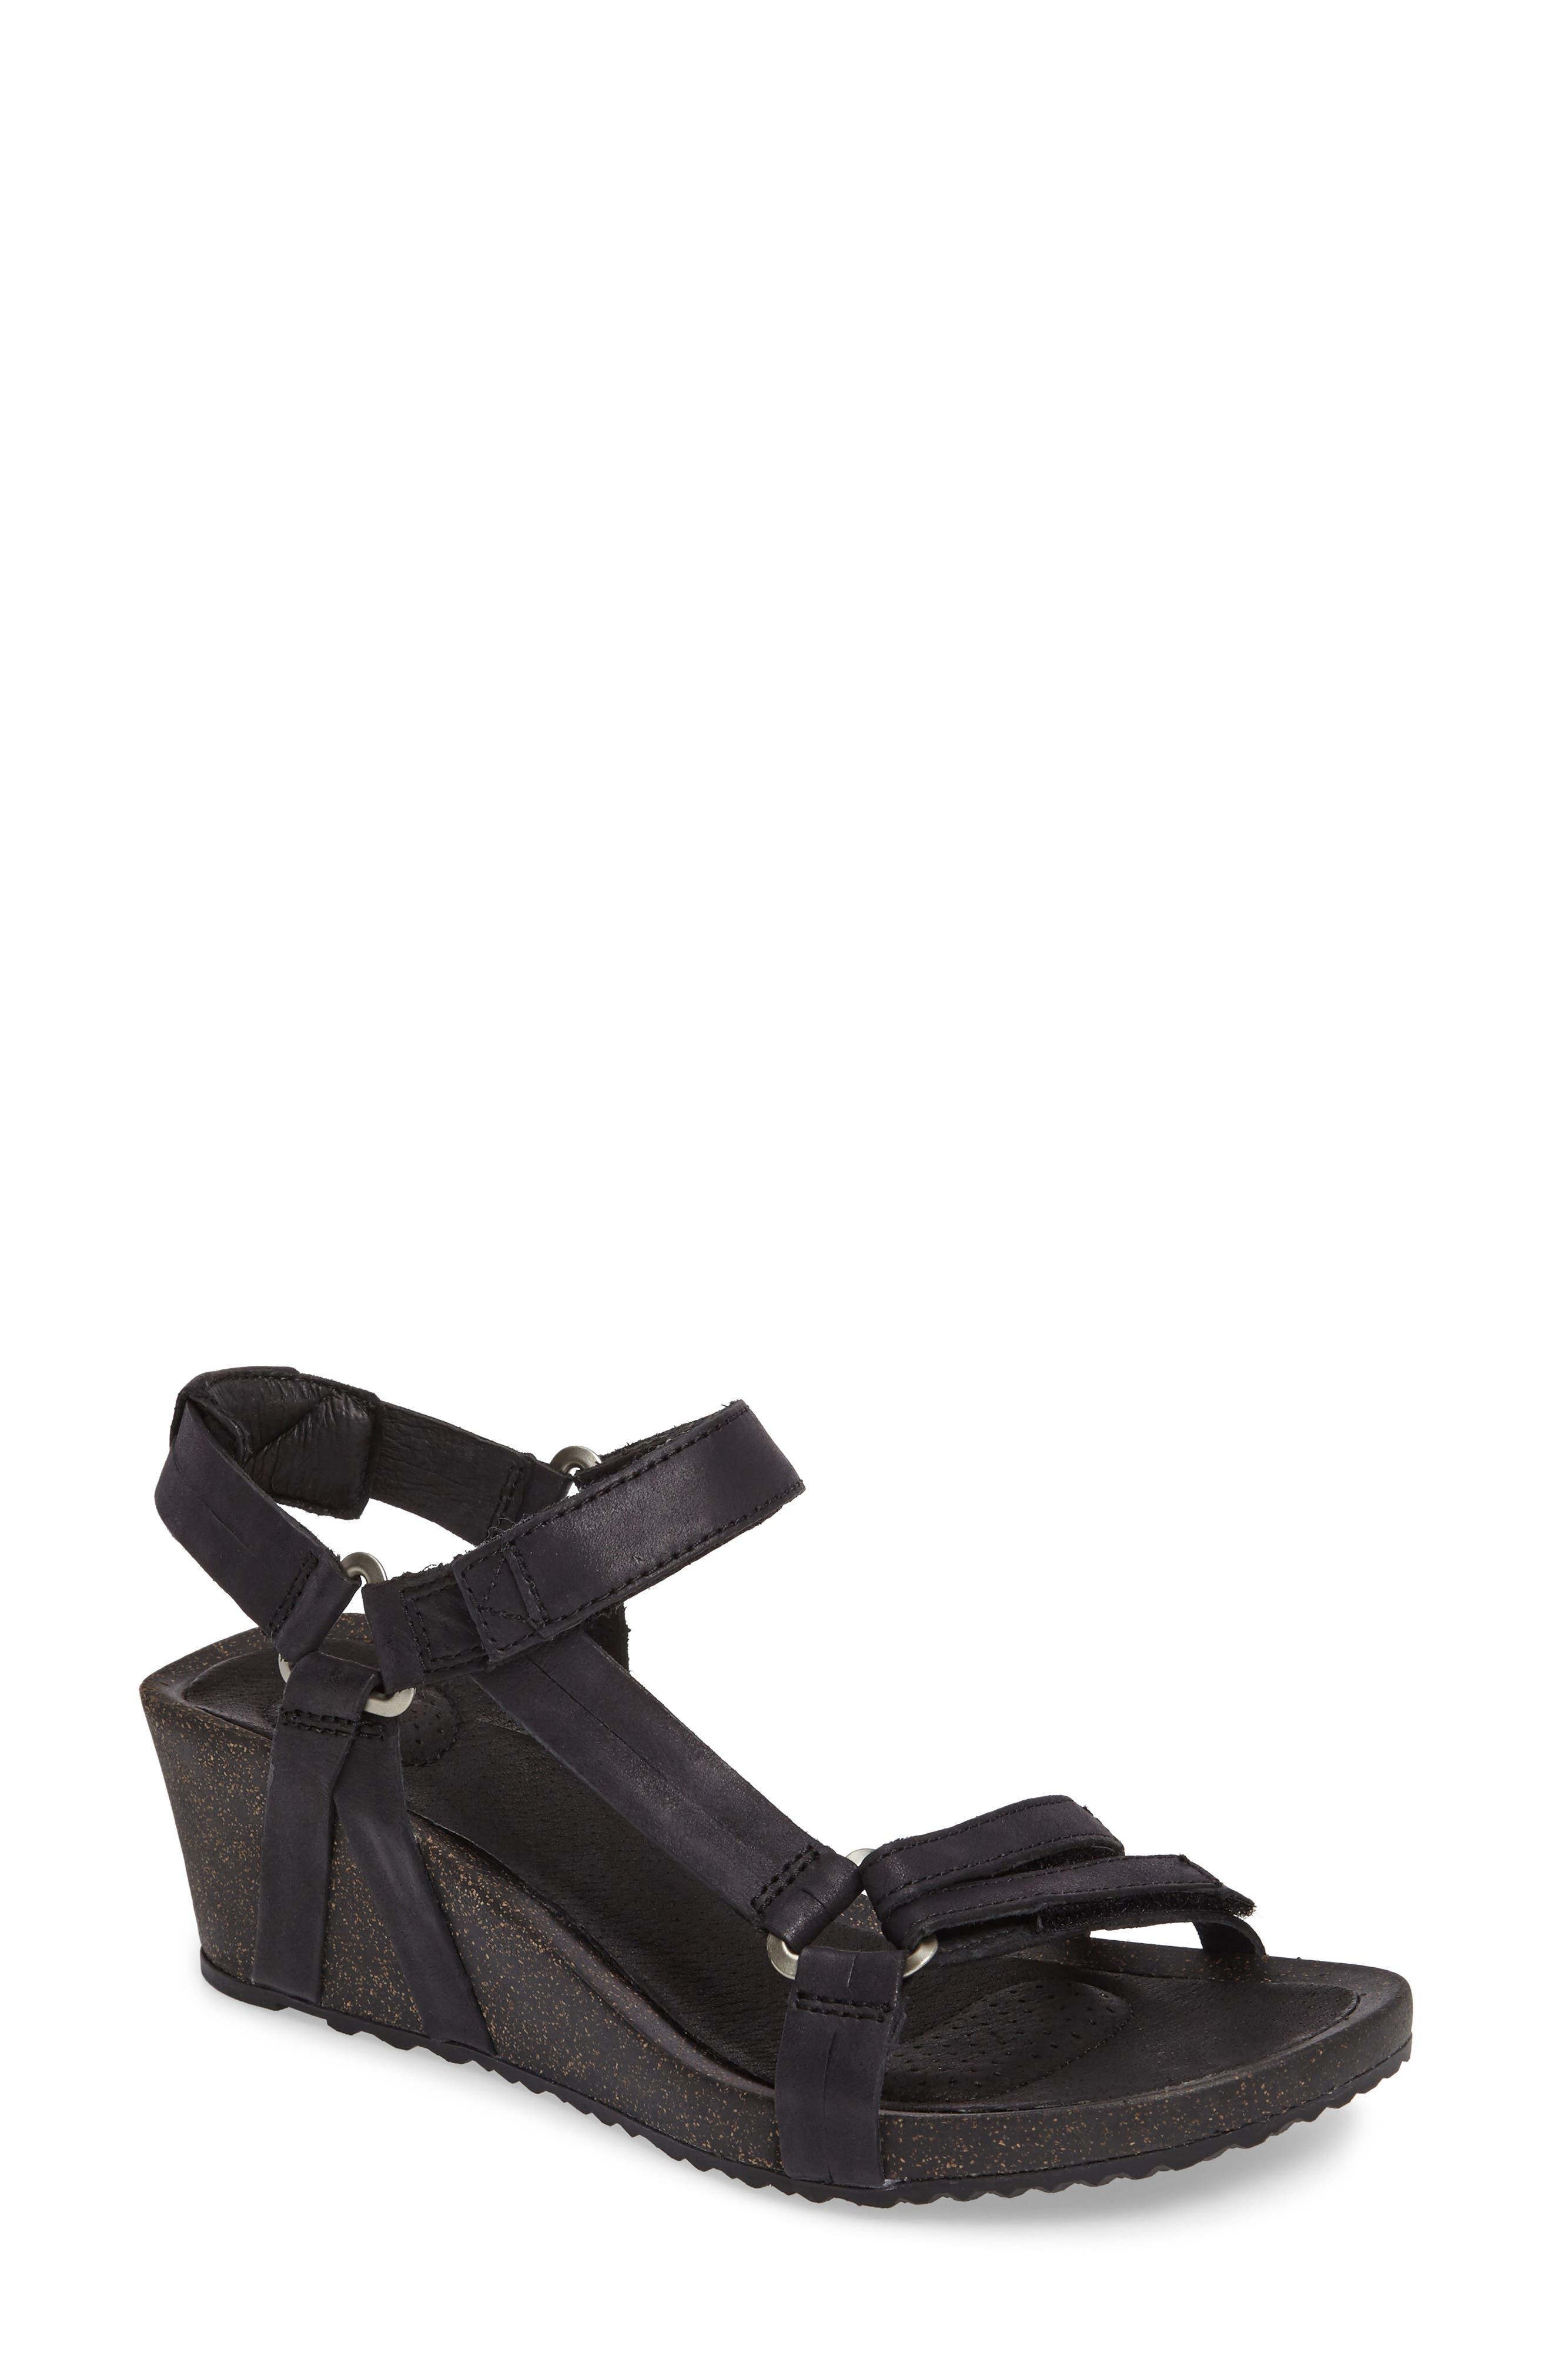 Alternate Image 1 Selected - Teva Ysidro Wedge Sandal (Women)